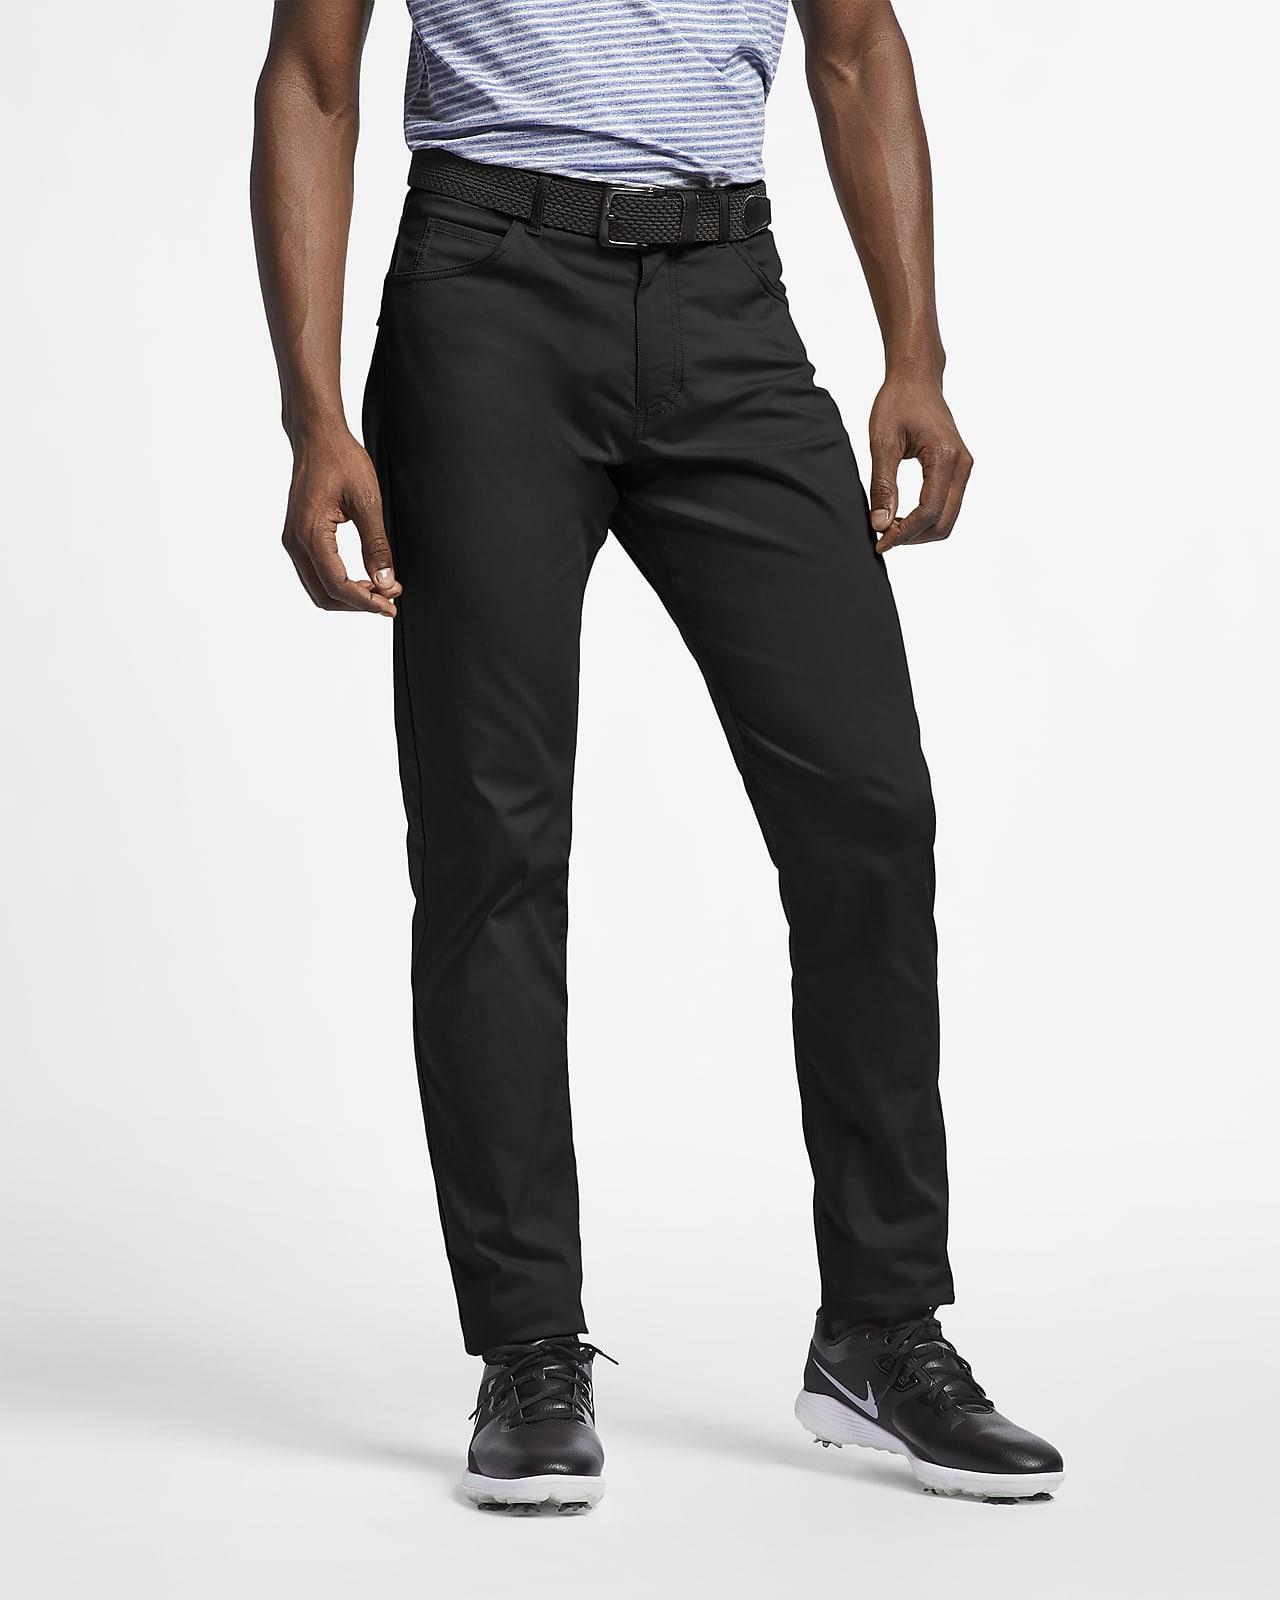 Nike Flex 5 Pocket Men's Slim Fit Golf Pants